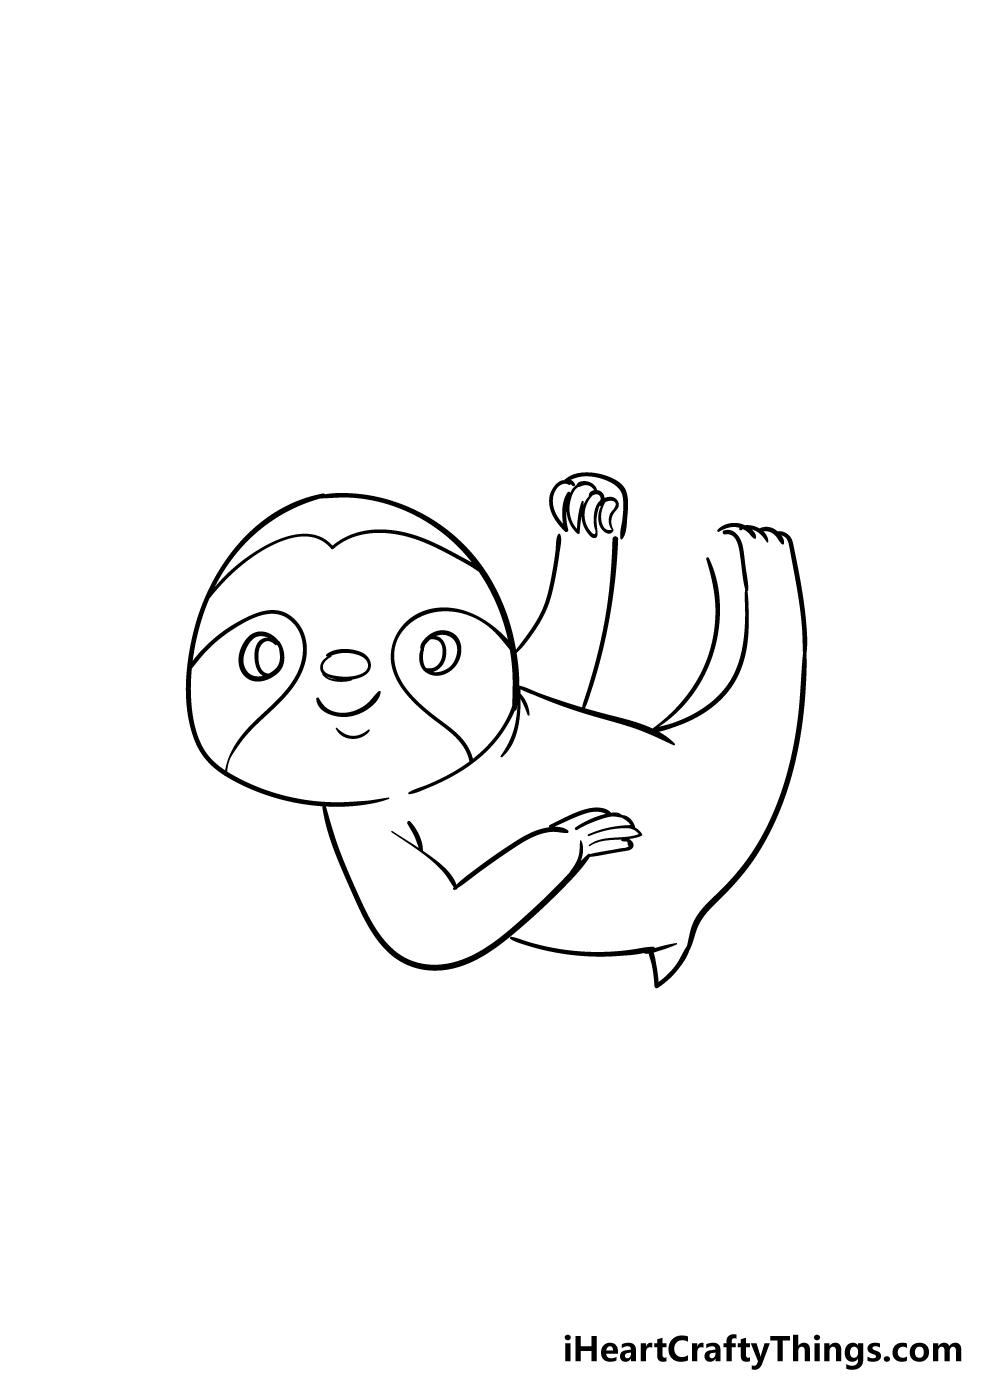 sloth drawing step 5